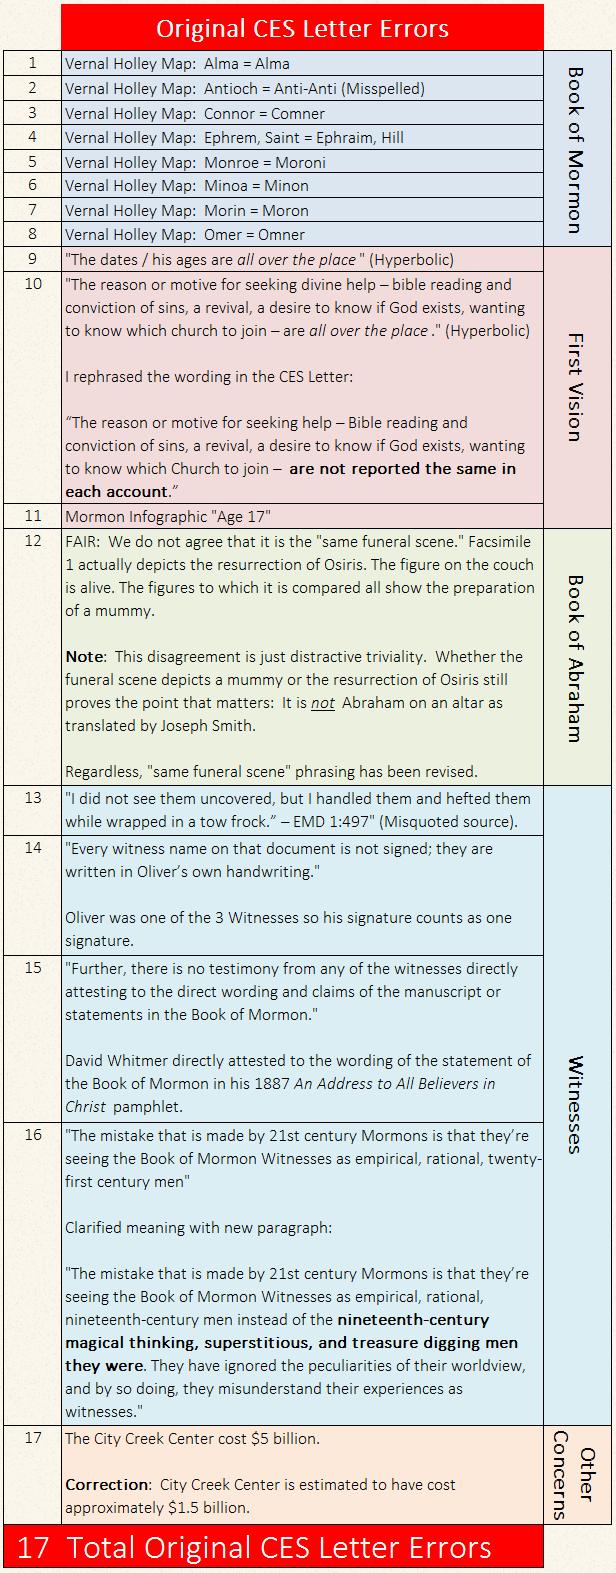 Debunking FairMormon Letter to a CES Director Original CES